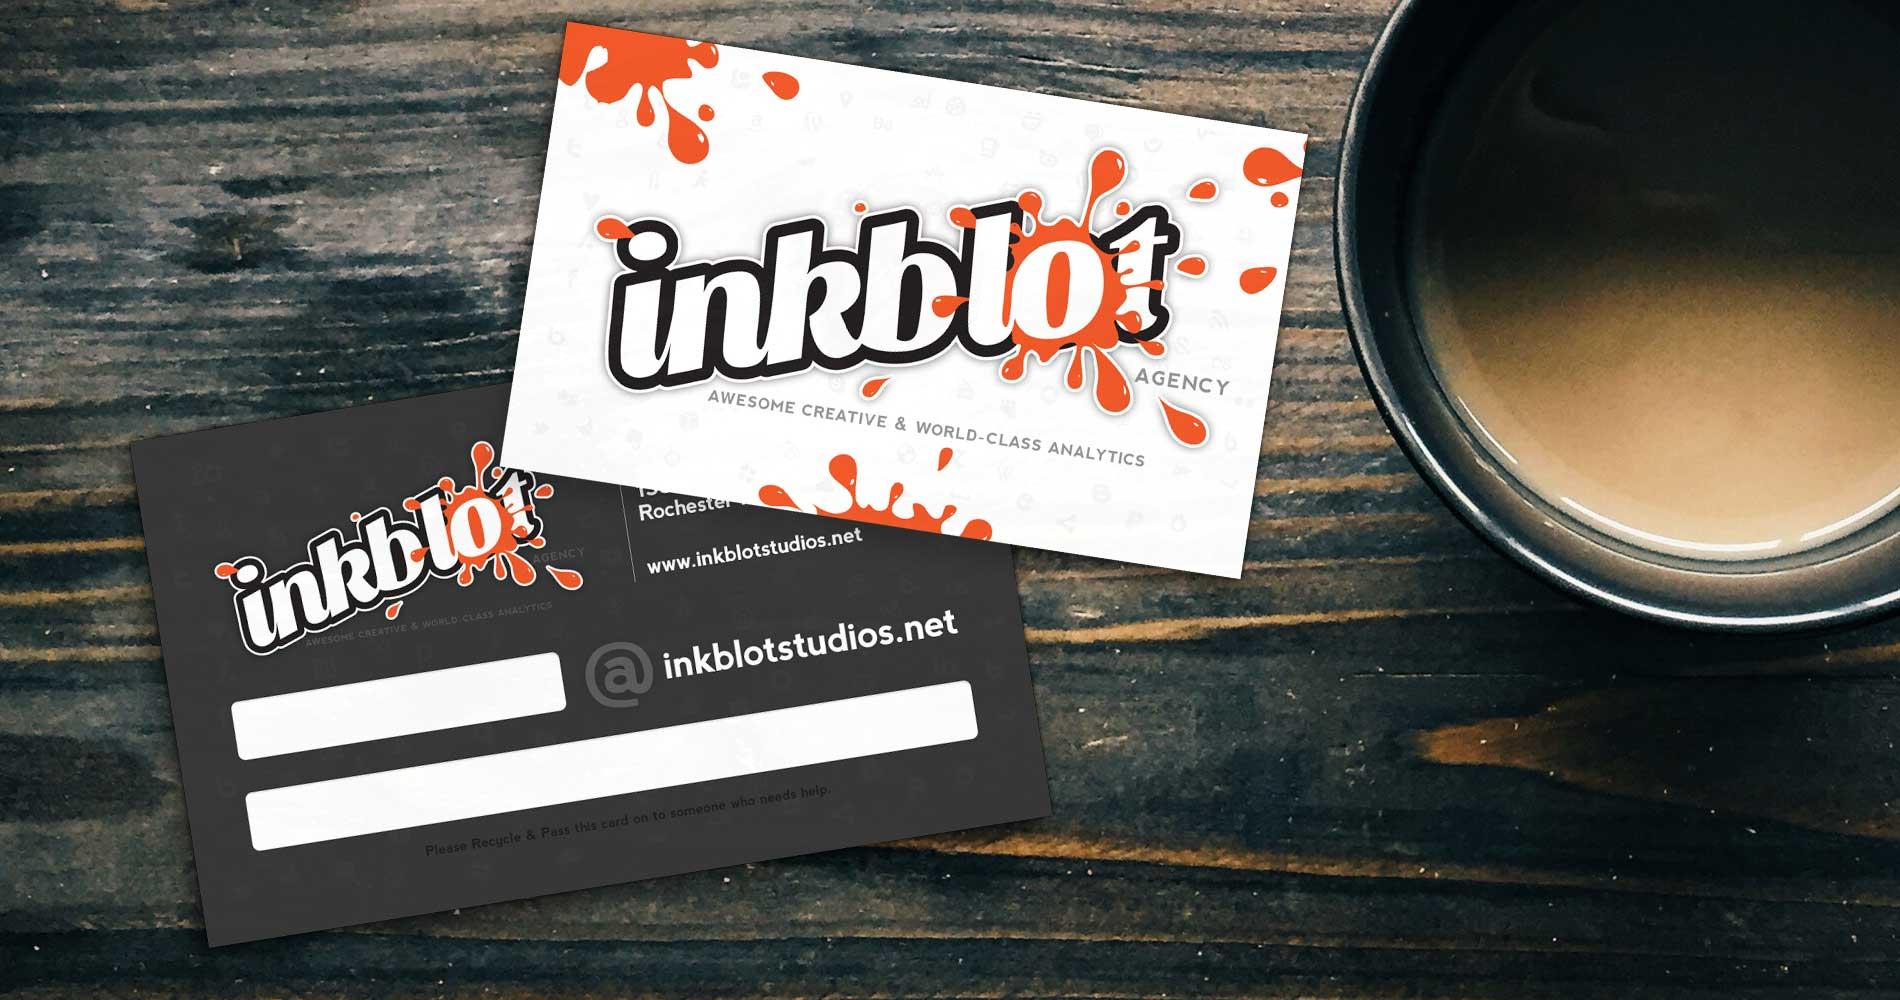 INK_01_header5